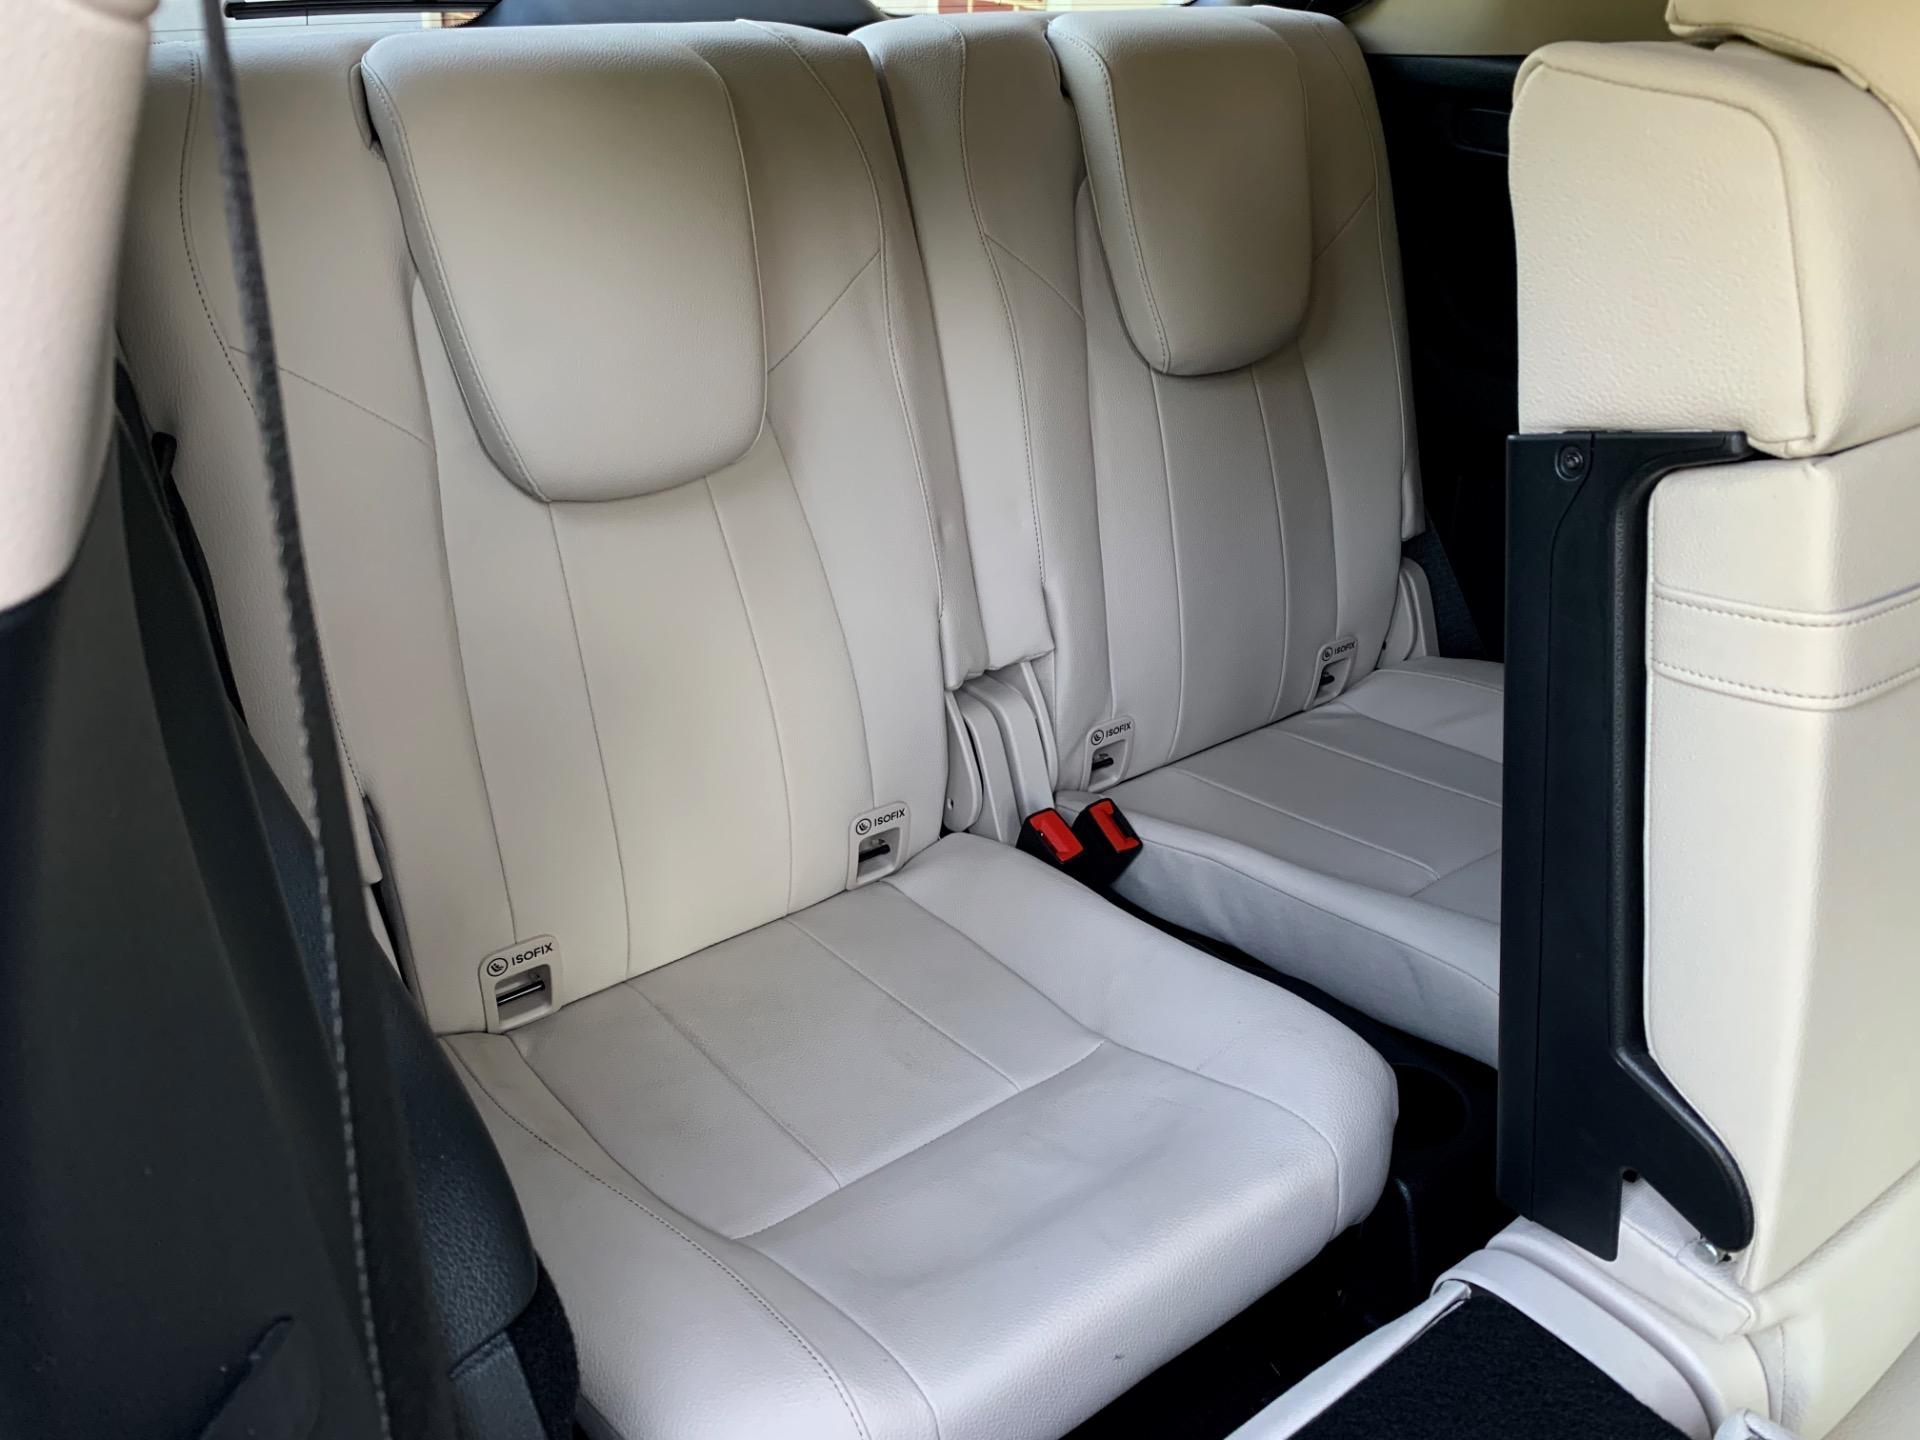 Used-2020-Mercedes-Benz-GLB-GLB-250-4MATIC